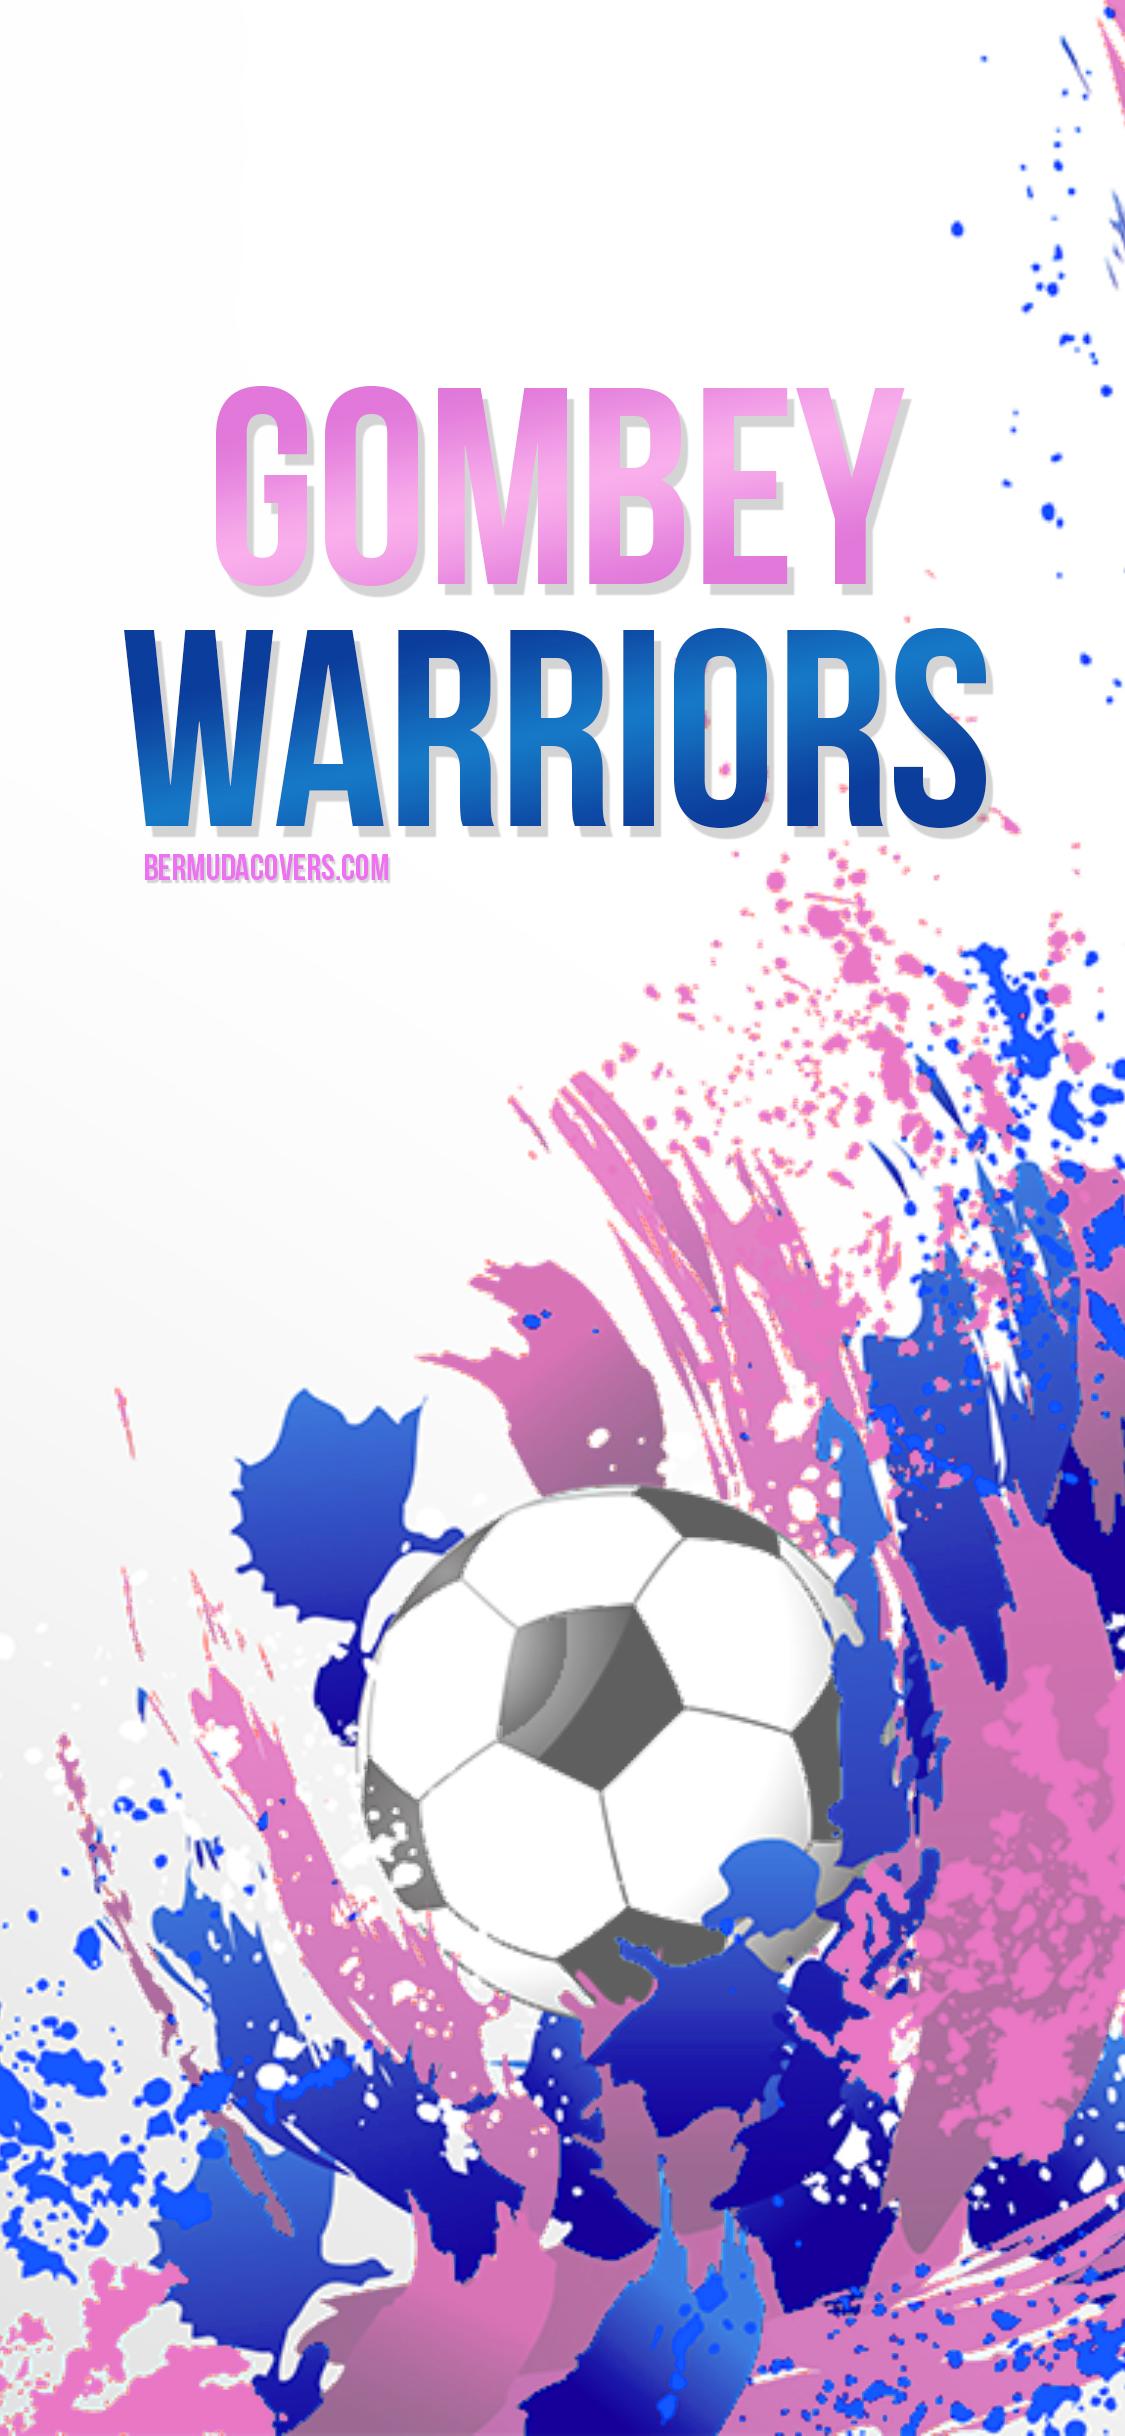 Gombey Warriors Bermuda Football Bernews Mobile Phone Wallpaper Lock Screen Design Image Photo XGRPGAM2